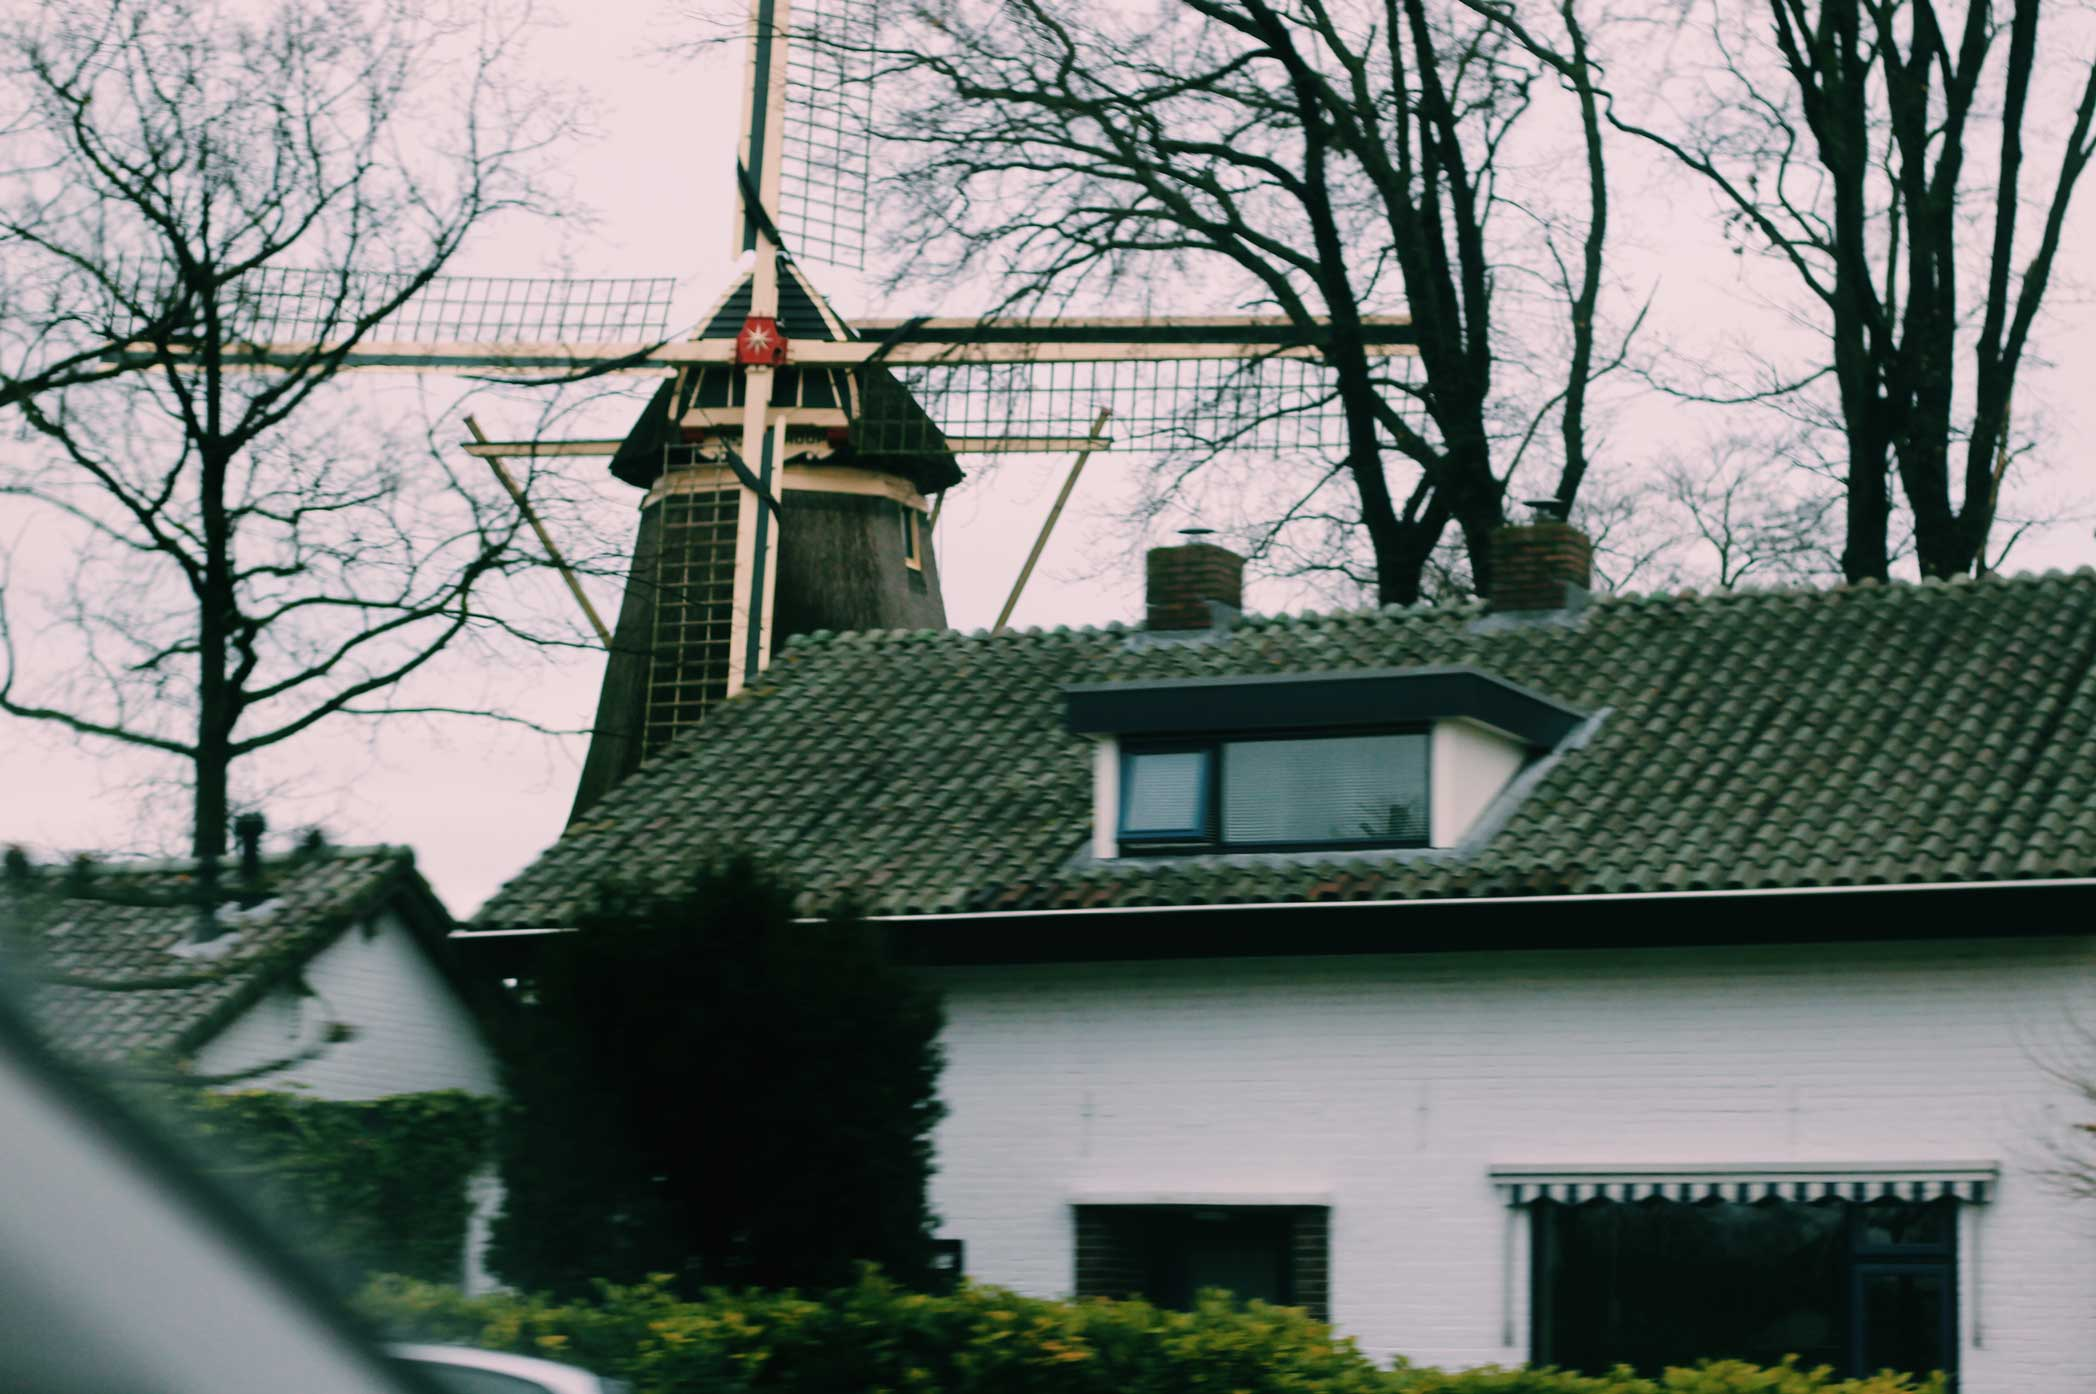 Oosterwolde, The Netherlands